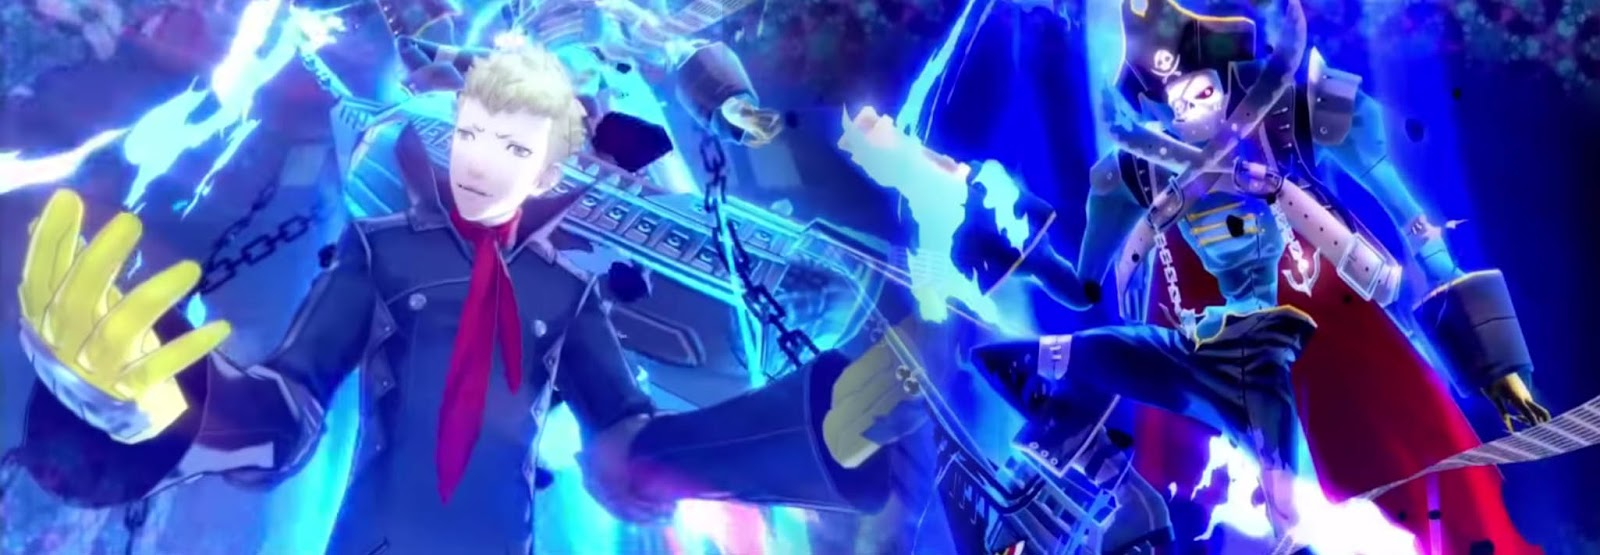 Persona 5 PV 03 Trailer Ryuji Sakamoto and Persona